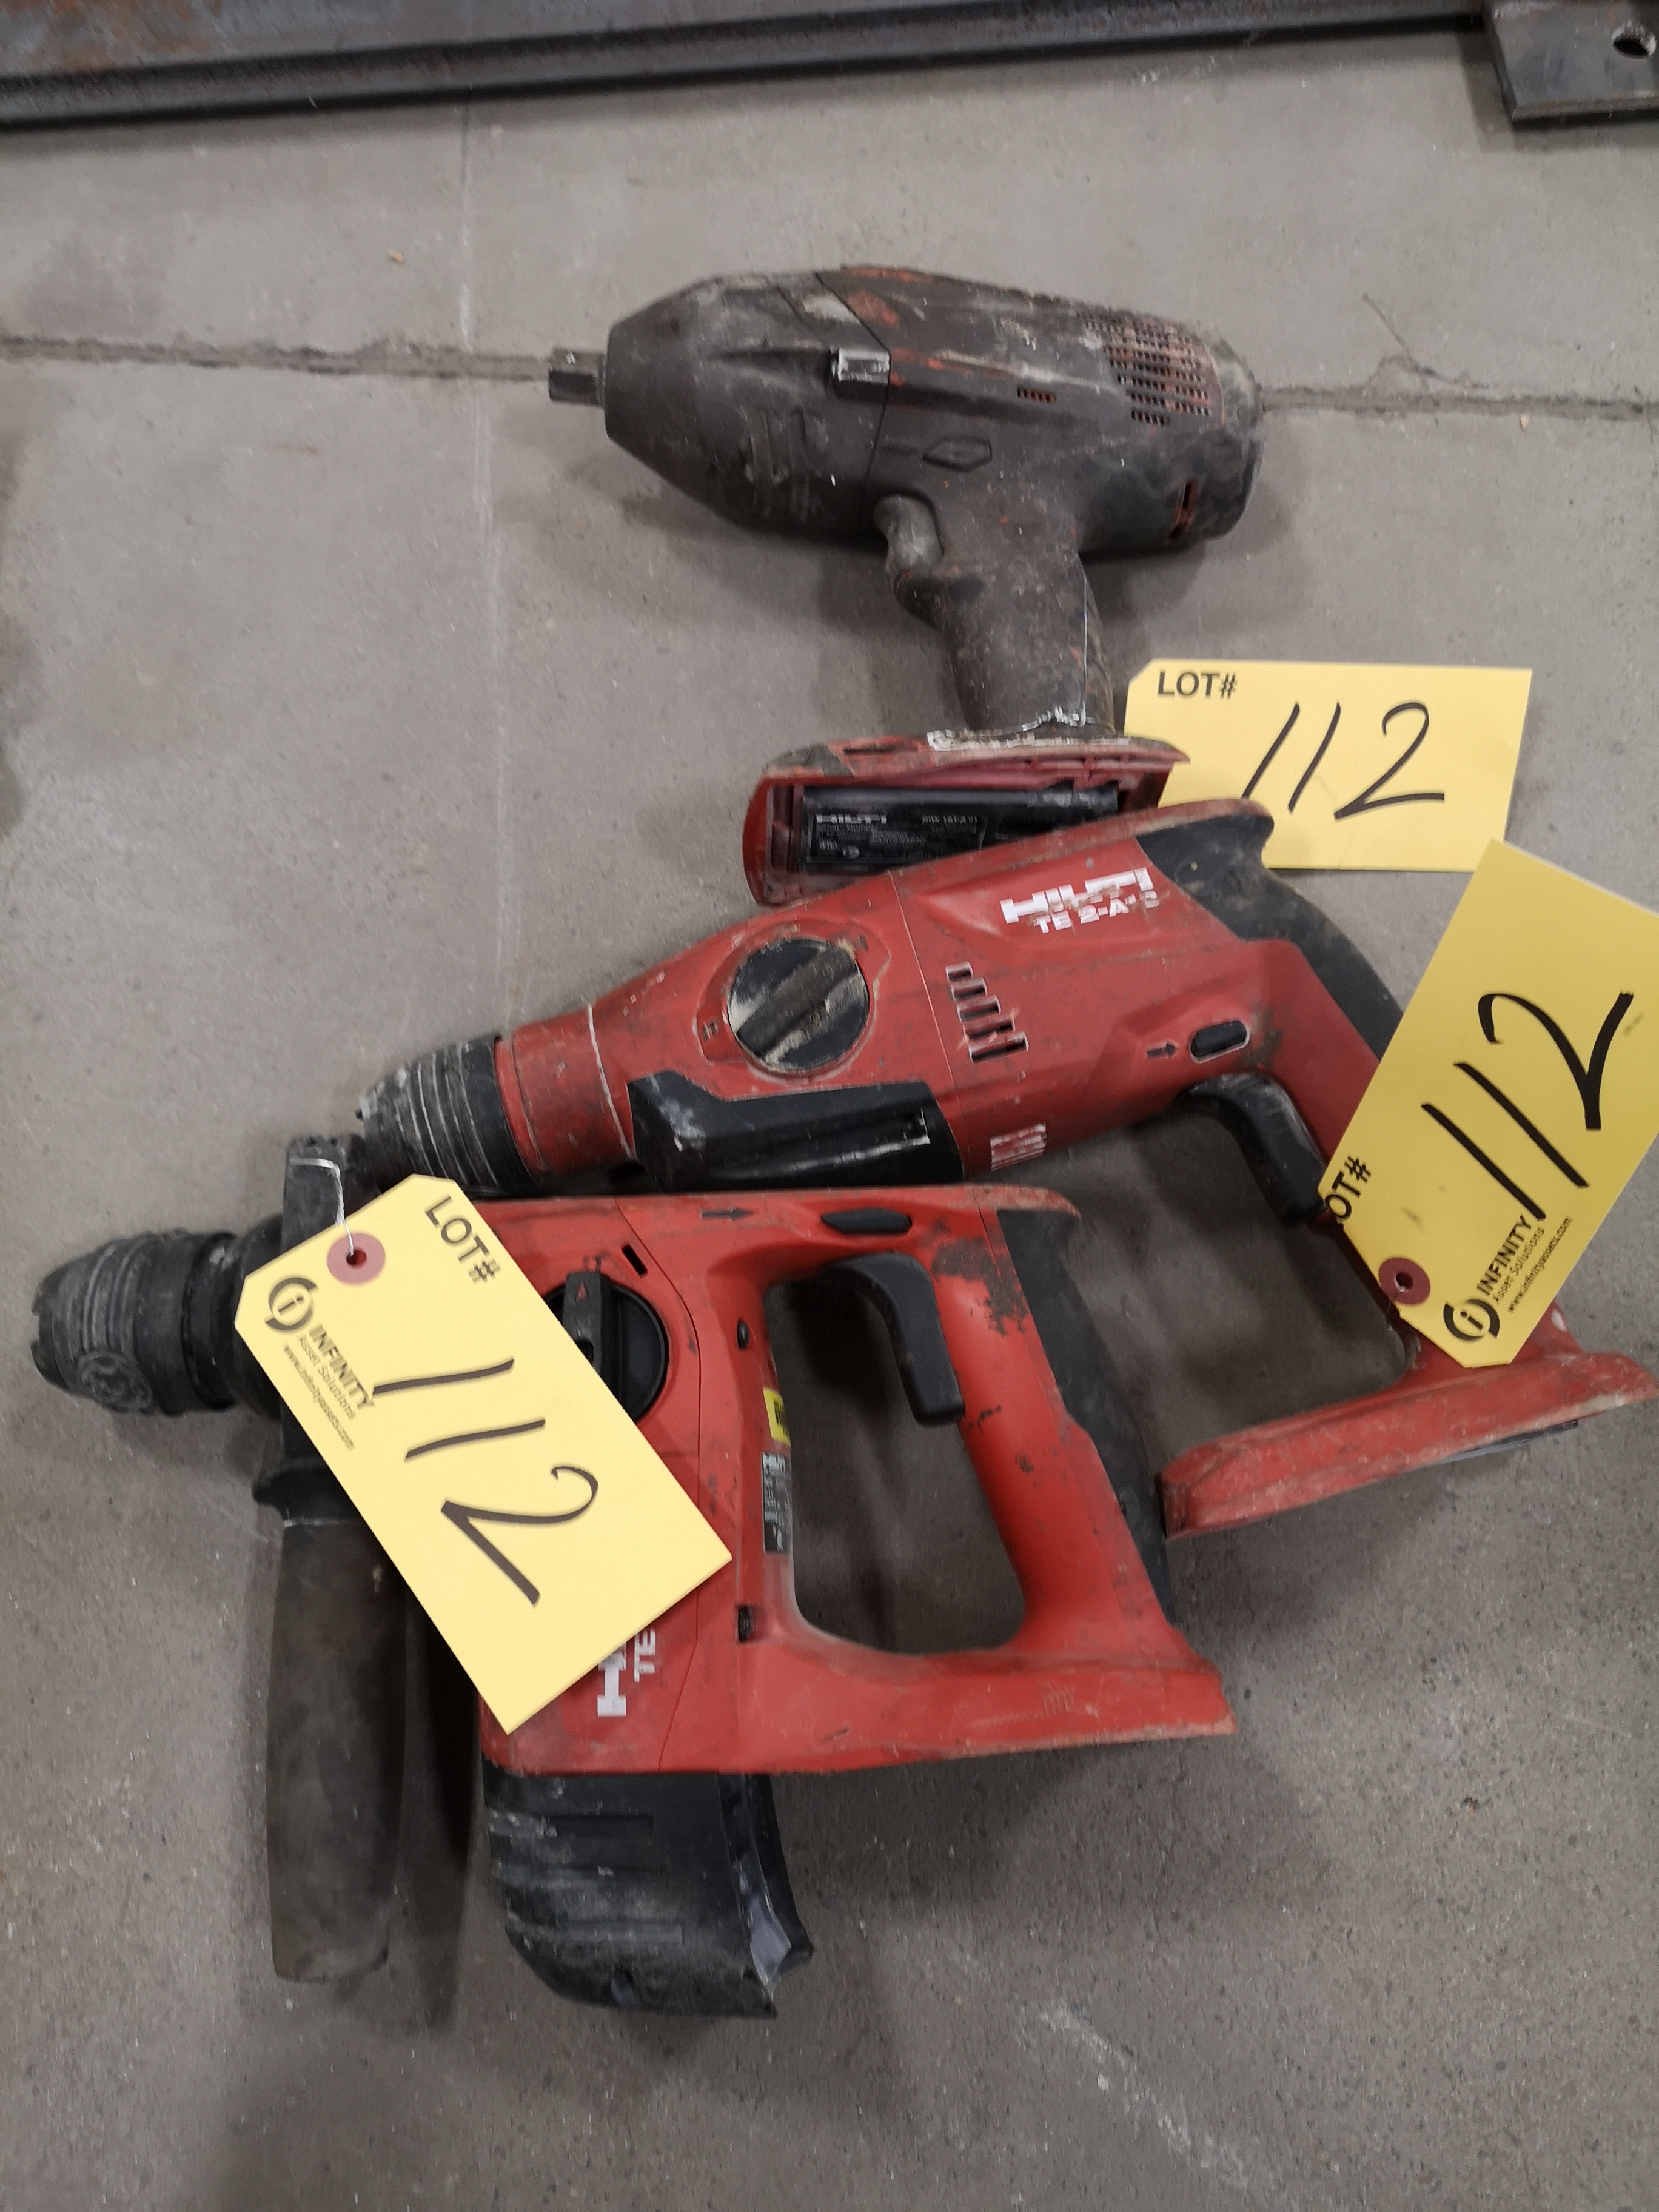 HILTI TE4-A18, TE2-A18 AND S1W18T-A (NO BATTERY OR CHARGER) (LOCATED AT 1135 STELLAR DRIVE,